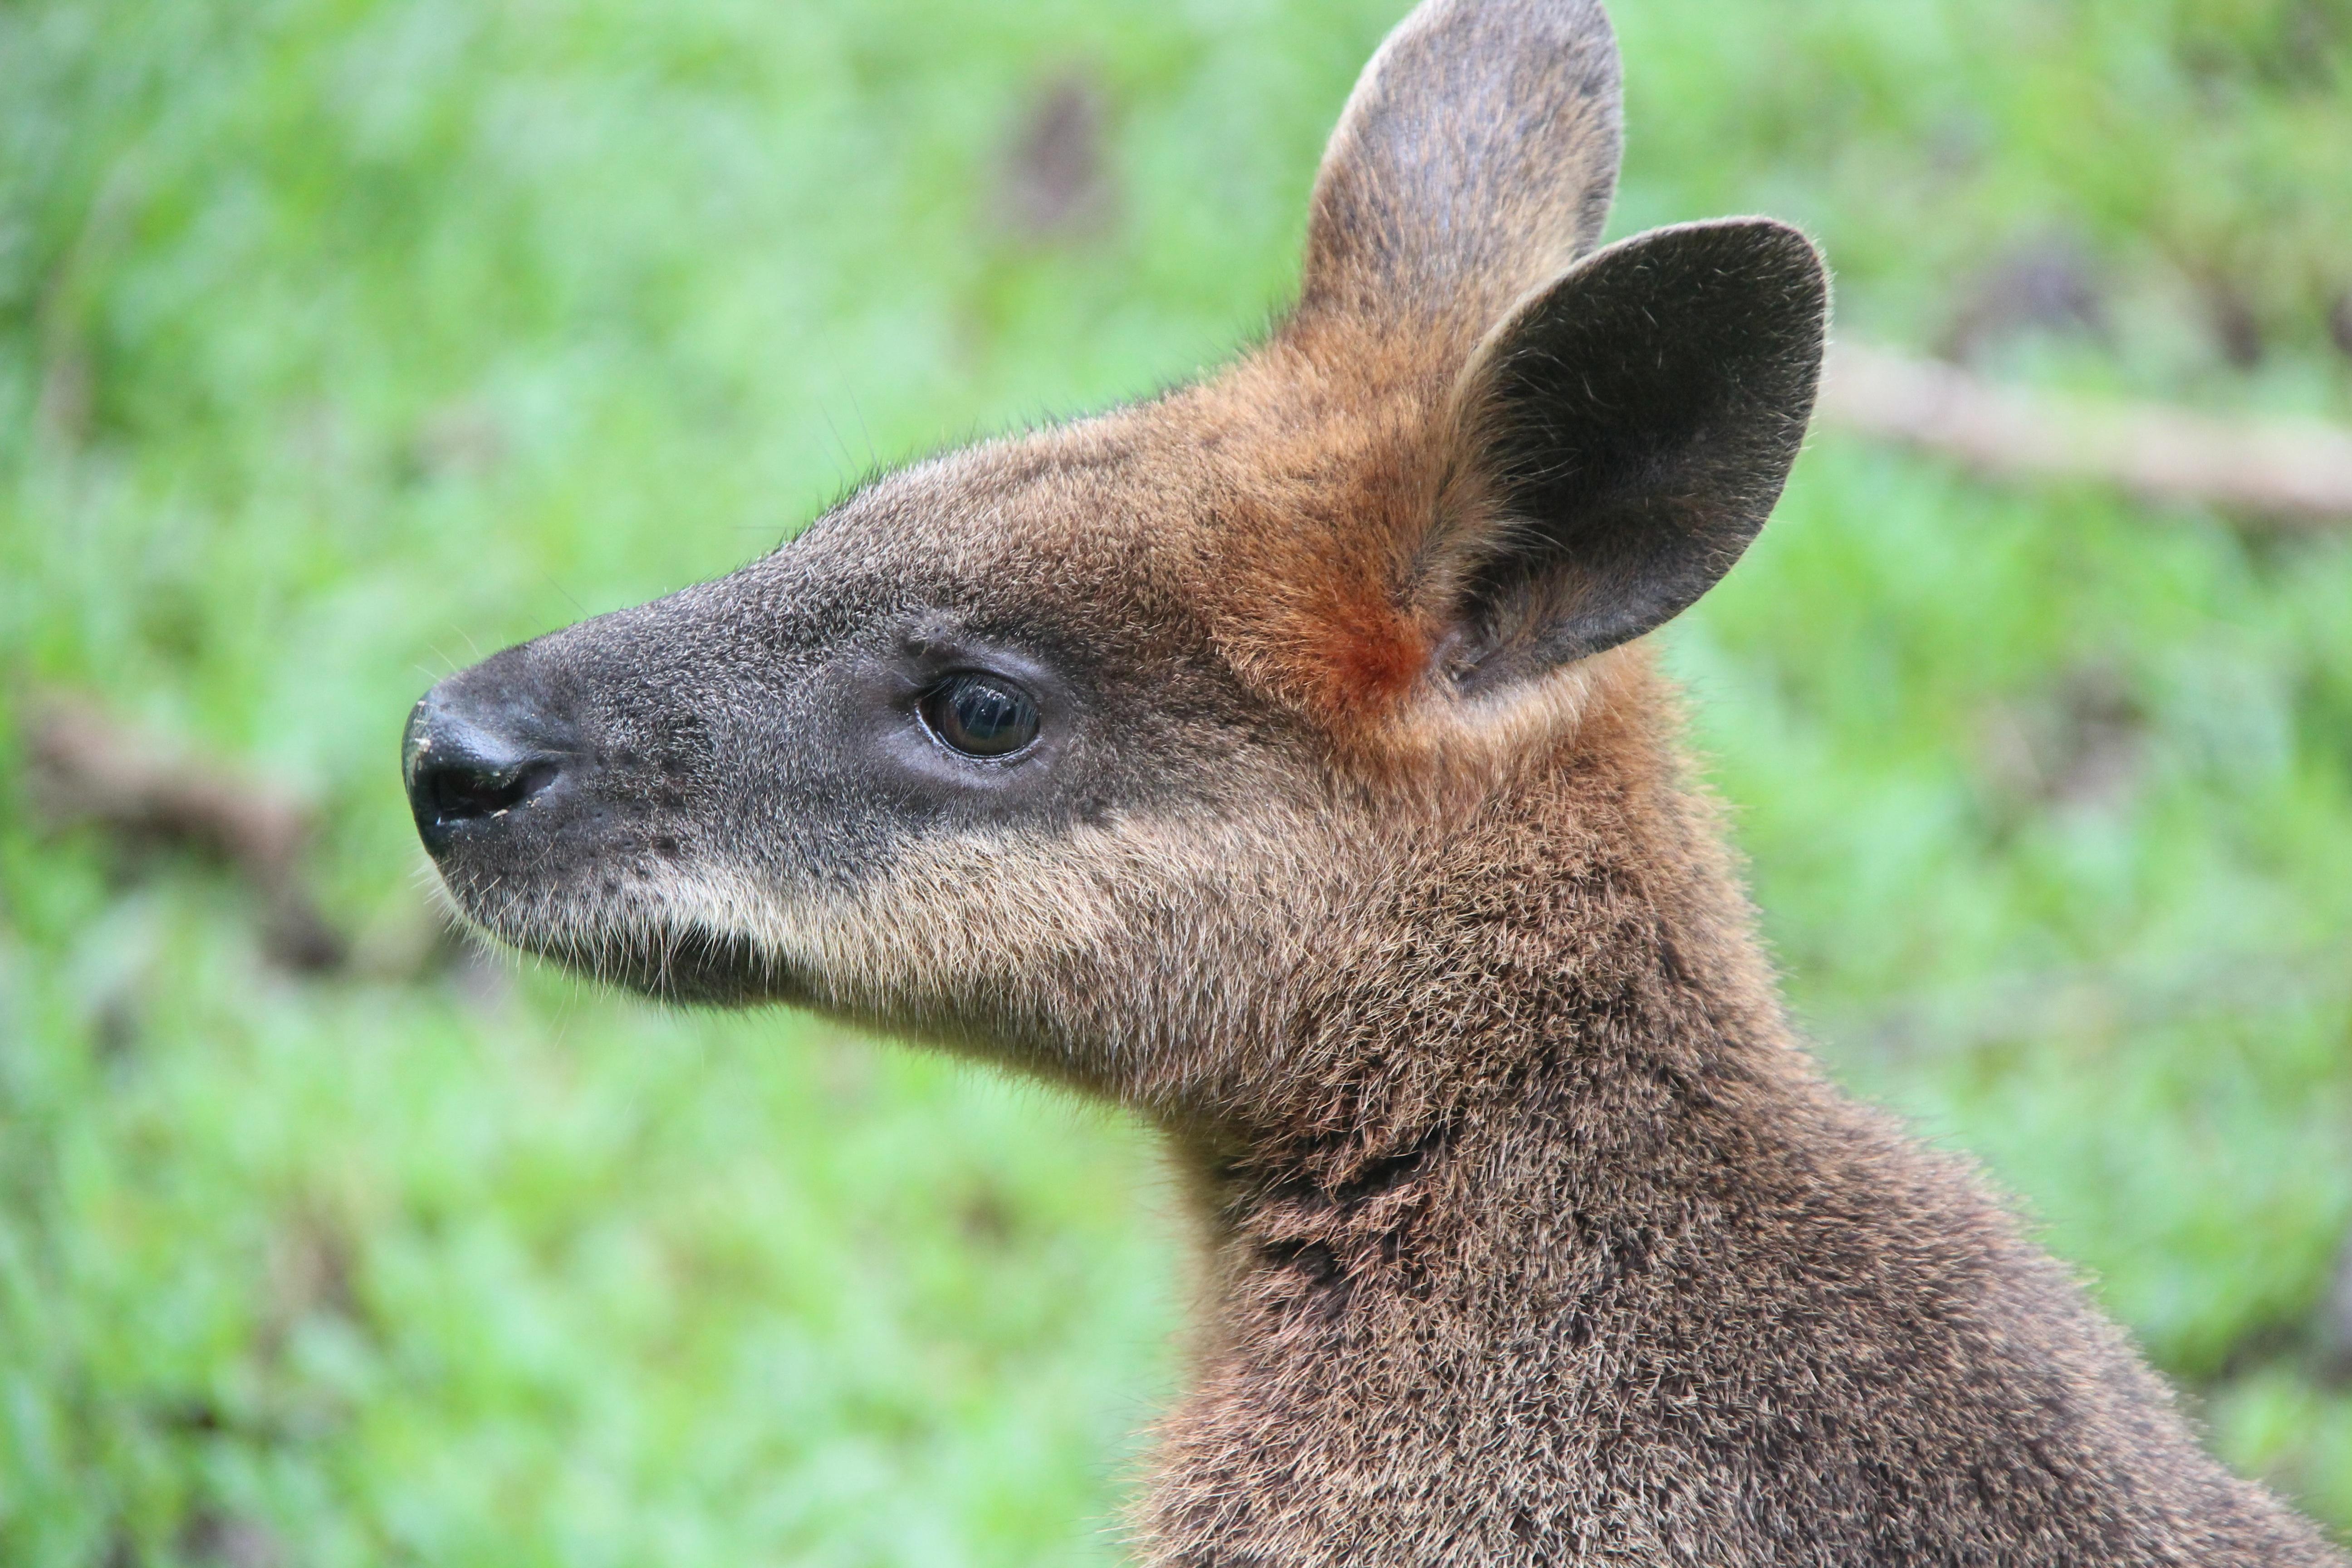 Gratis billeder : natur, dyr, dyreliv, hjort, pattedyr, fauna, kænguru, wallaby, Australien ...